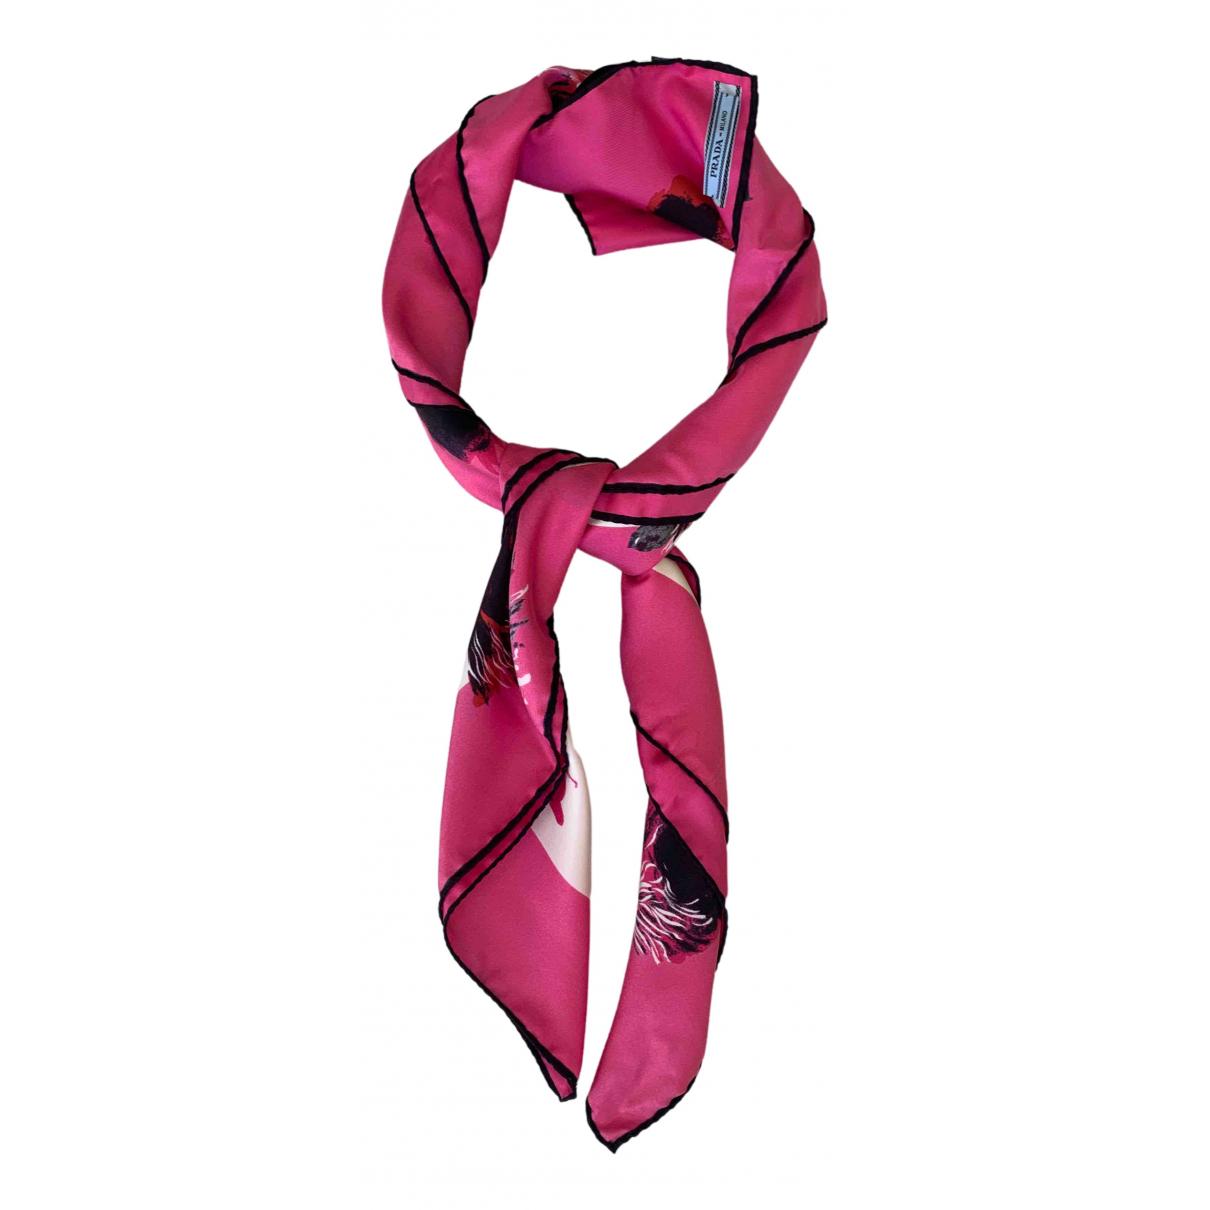 Prada - Foulard   pour femme en soie - rose